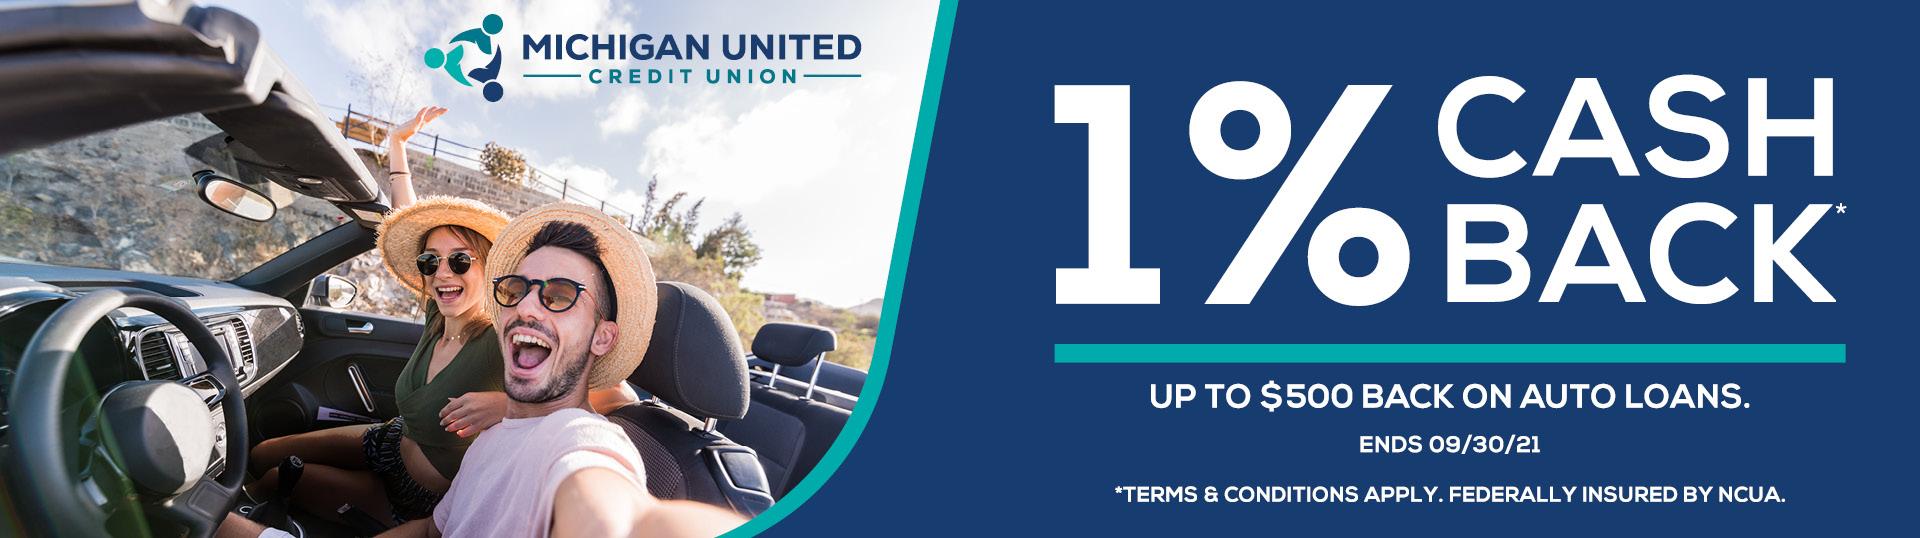 1% Cash Back Michigan United Credit Union